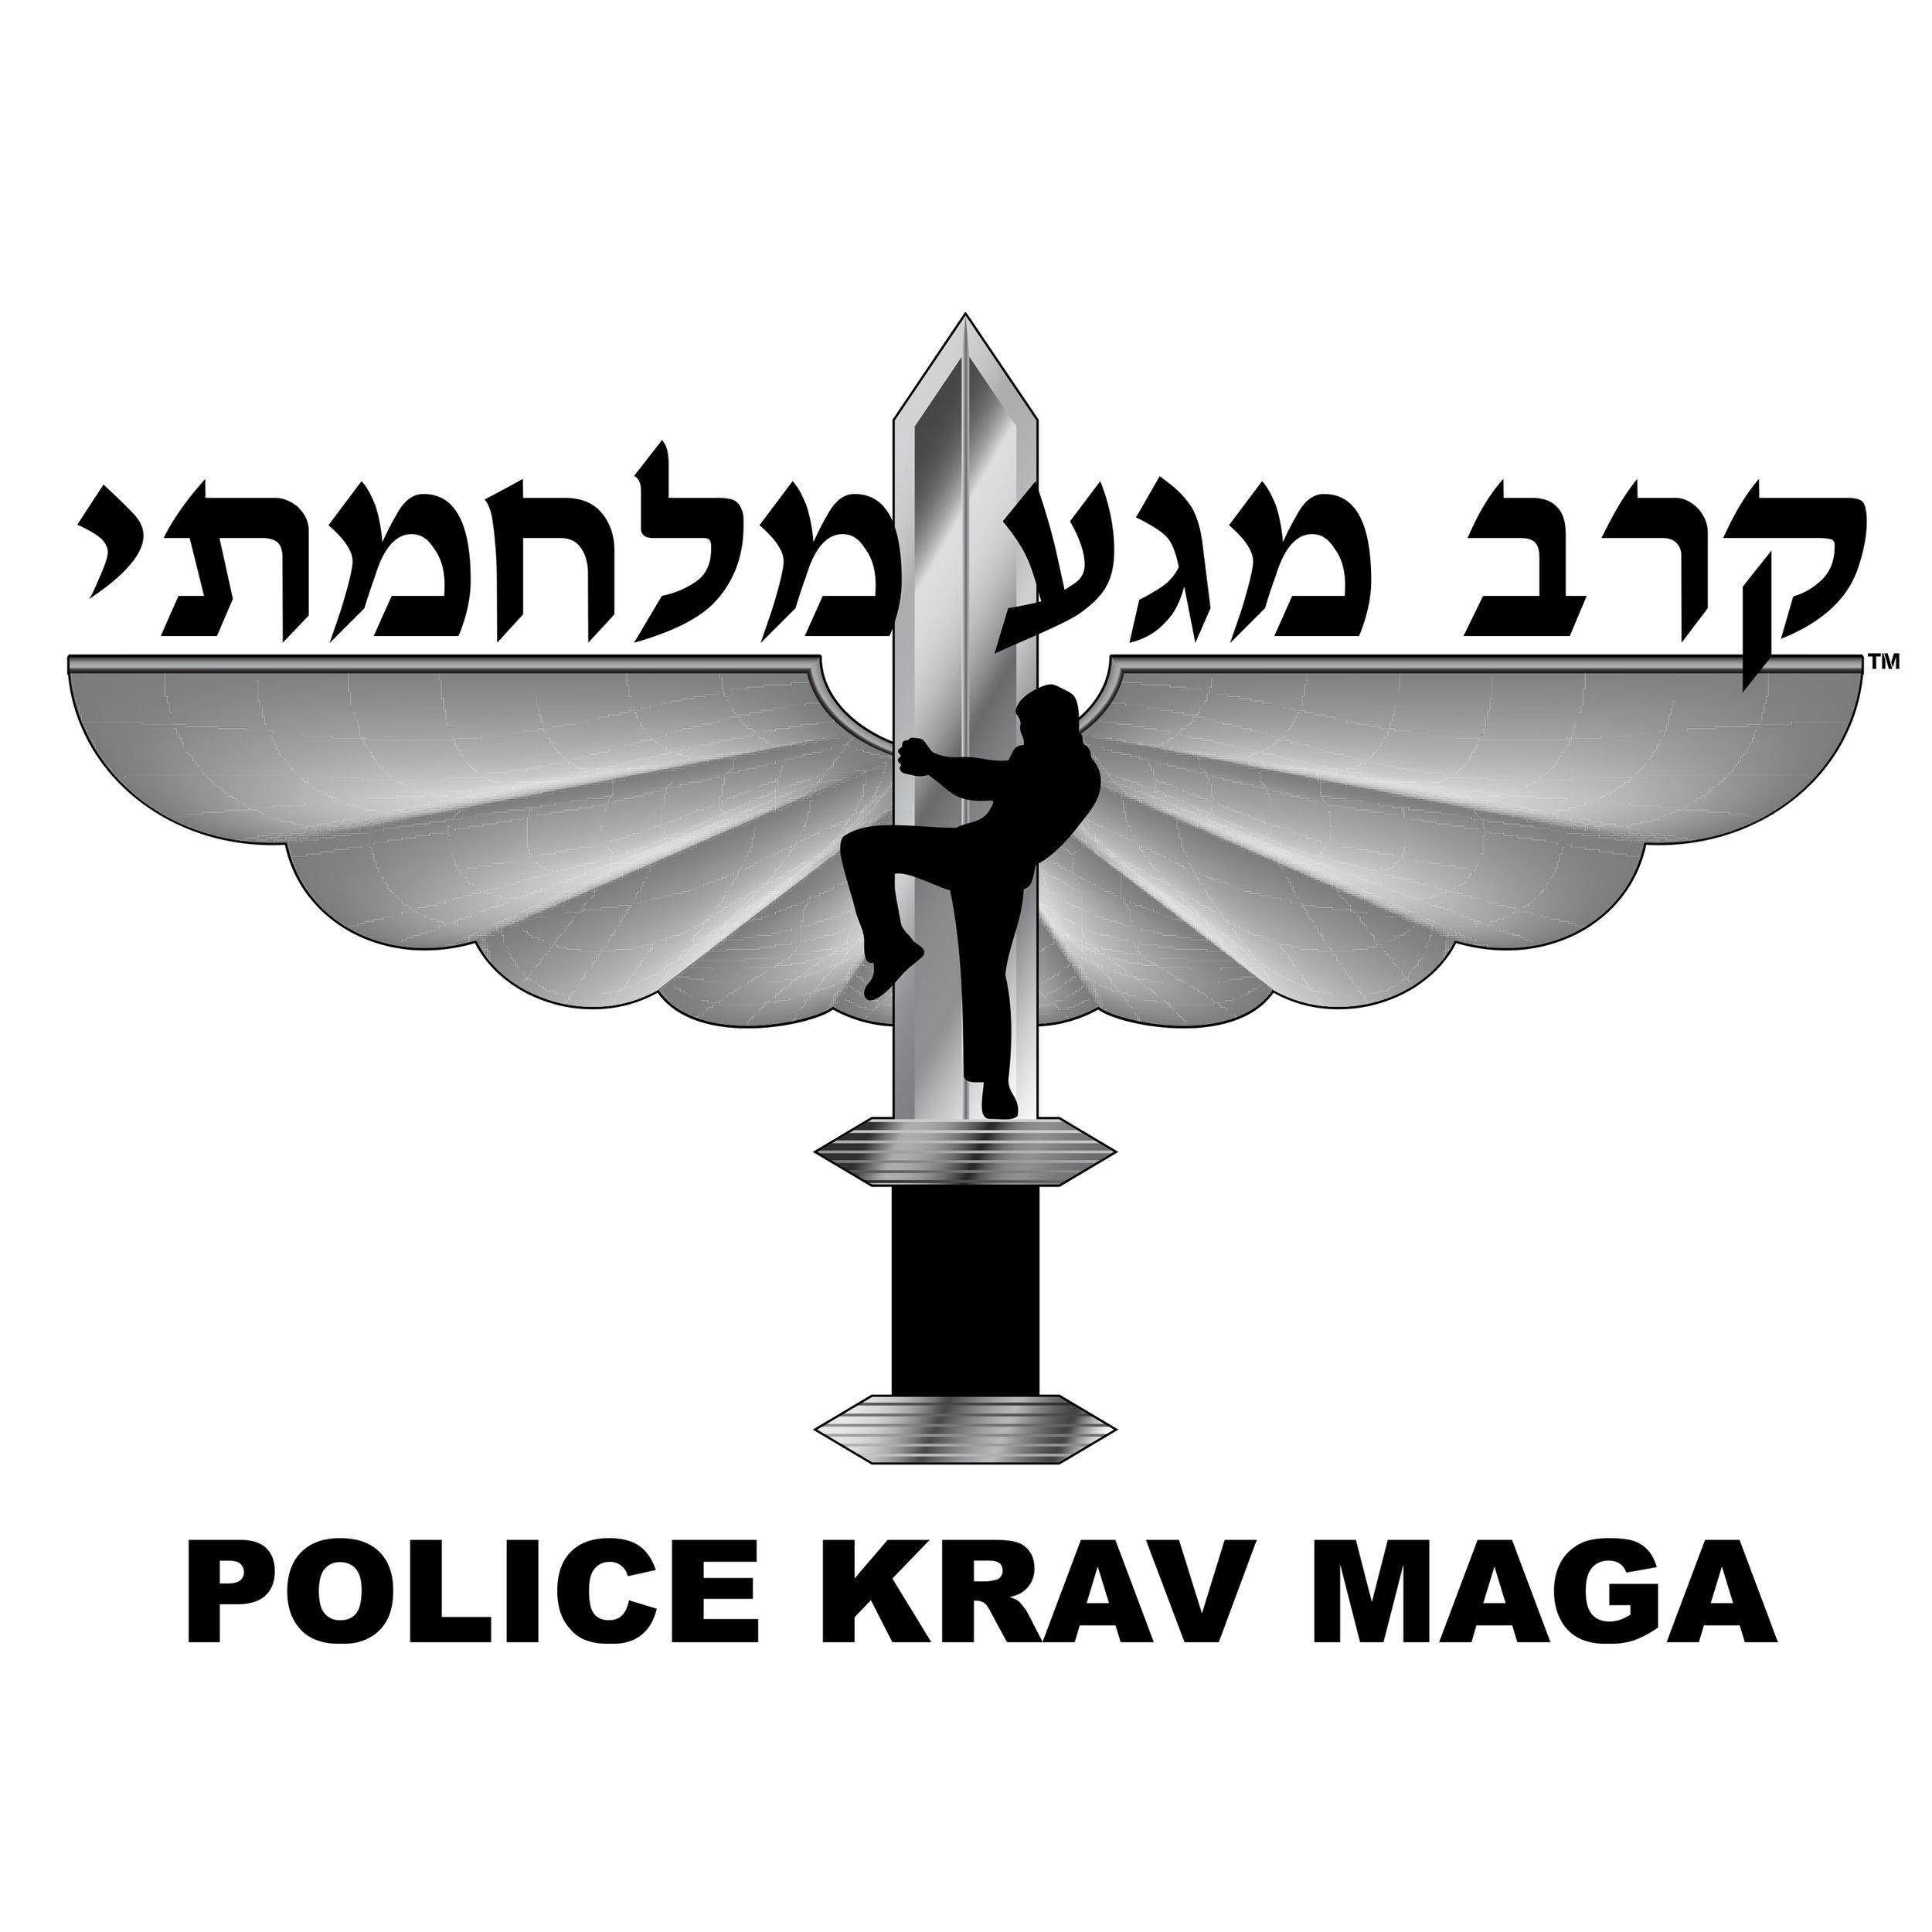 POLICE KRAV MAGA